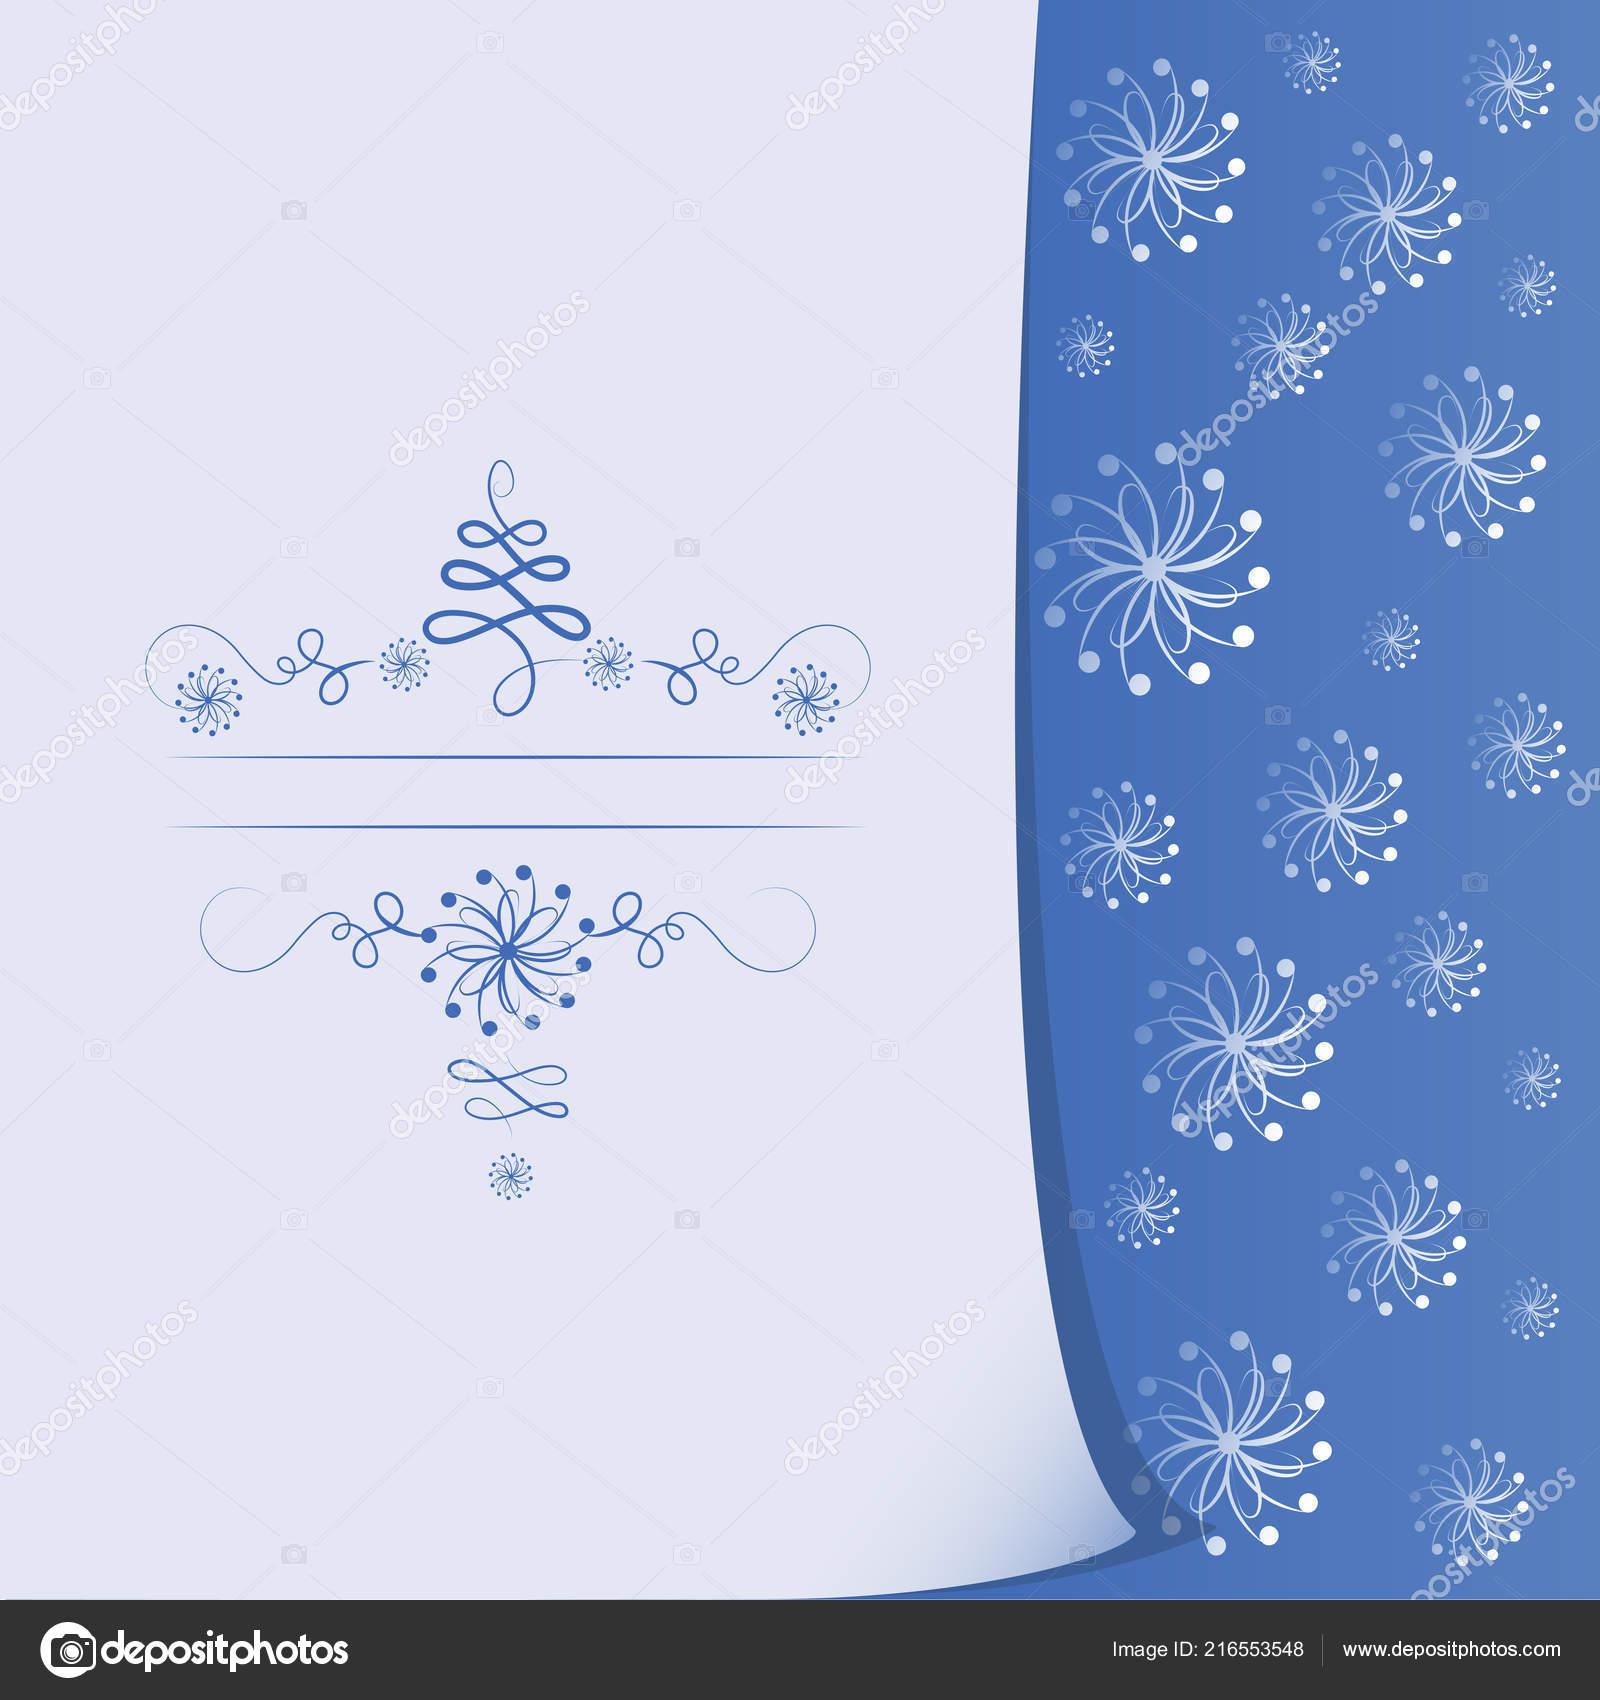 https depositphotos com 216553548 stock illustration christmas poster linear openwork image html